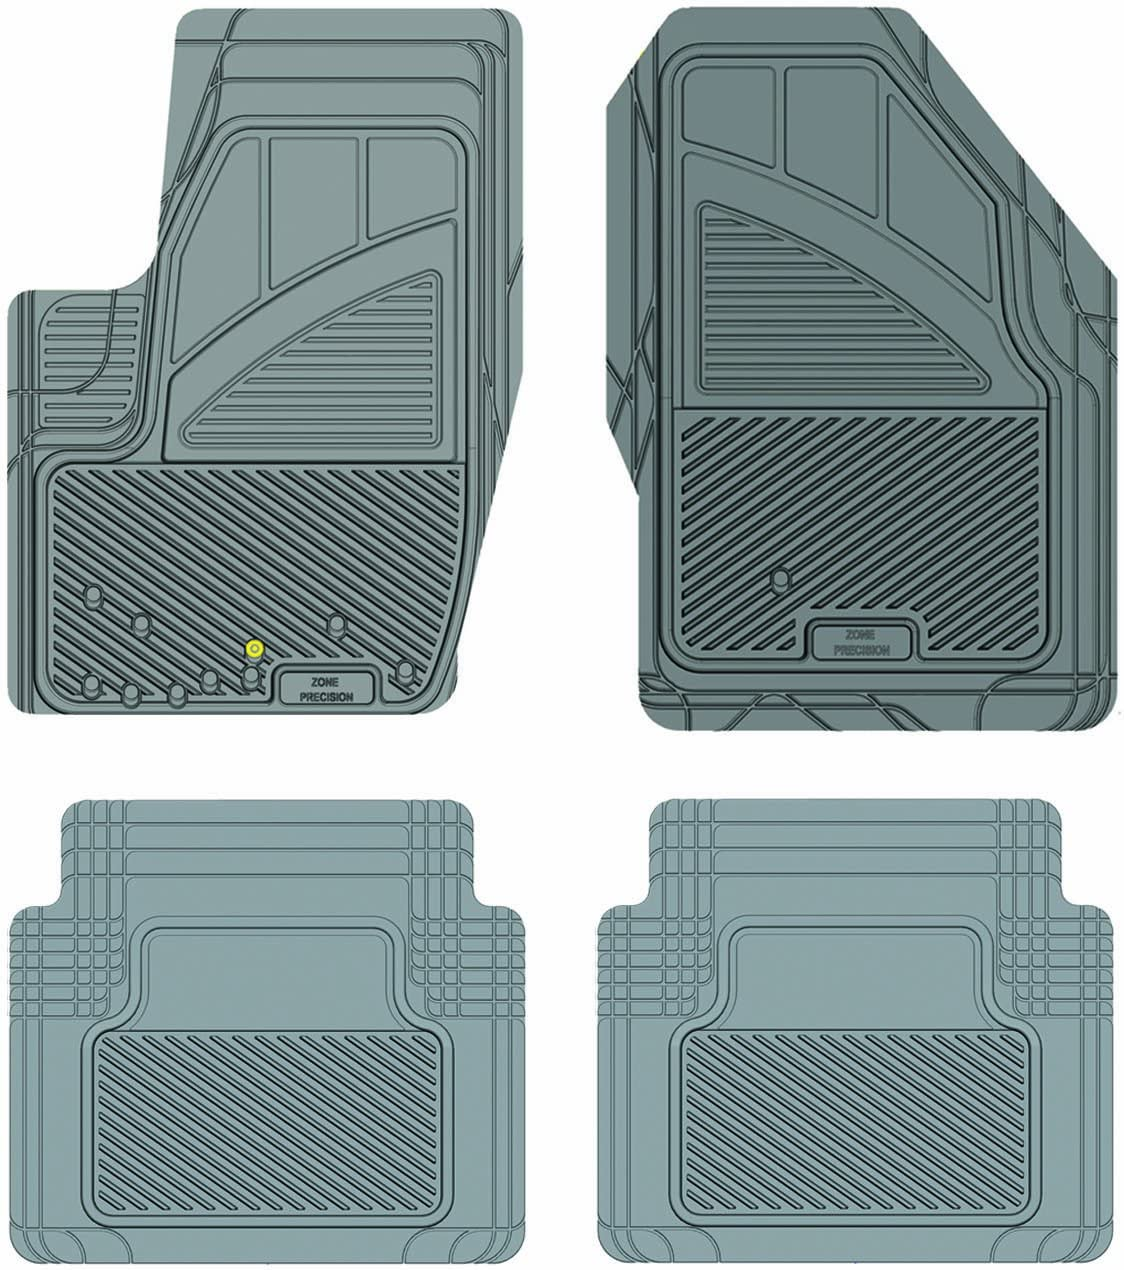 2003 2007 2009 2004 2008 2010 Lexus SC 430 Grey Loop Driver /& Passenger Floor 2006 2005 GGBAILEY D3043A-F1A-GY-LP Custom Fit Car Mats for 2002